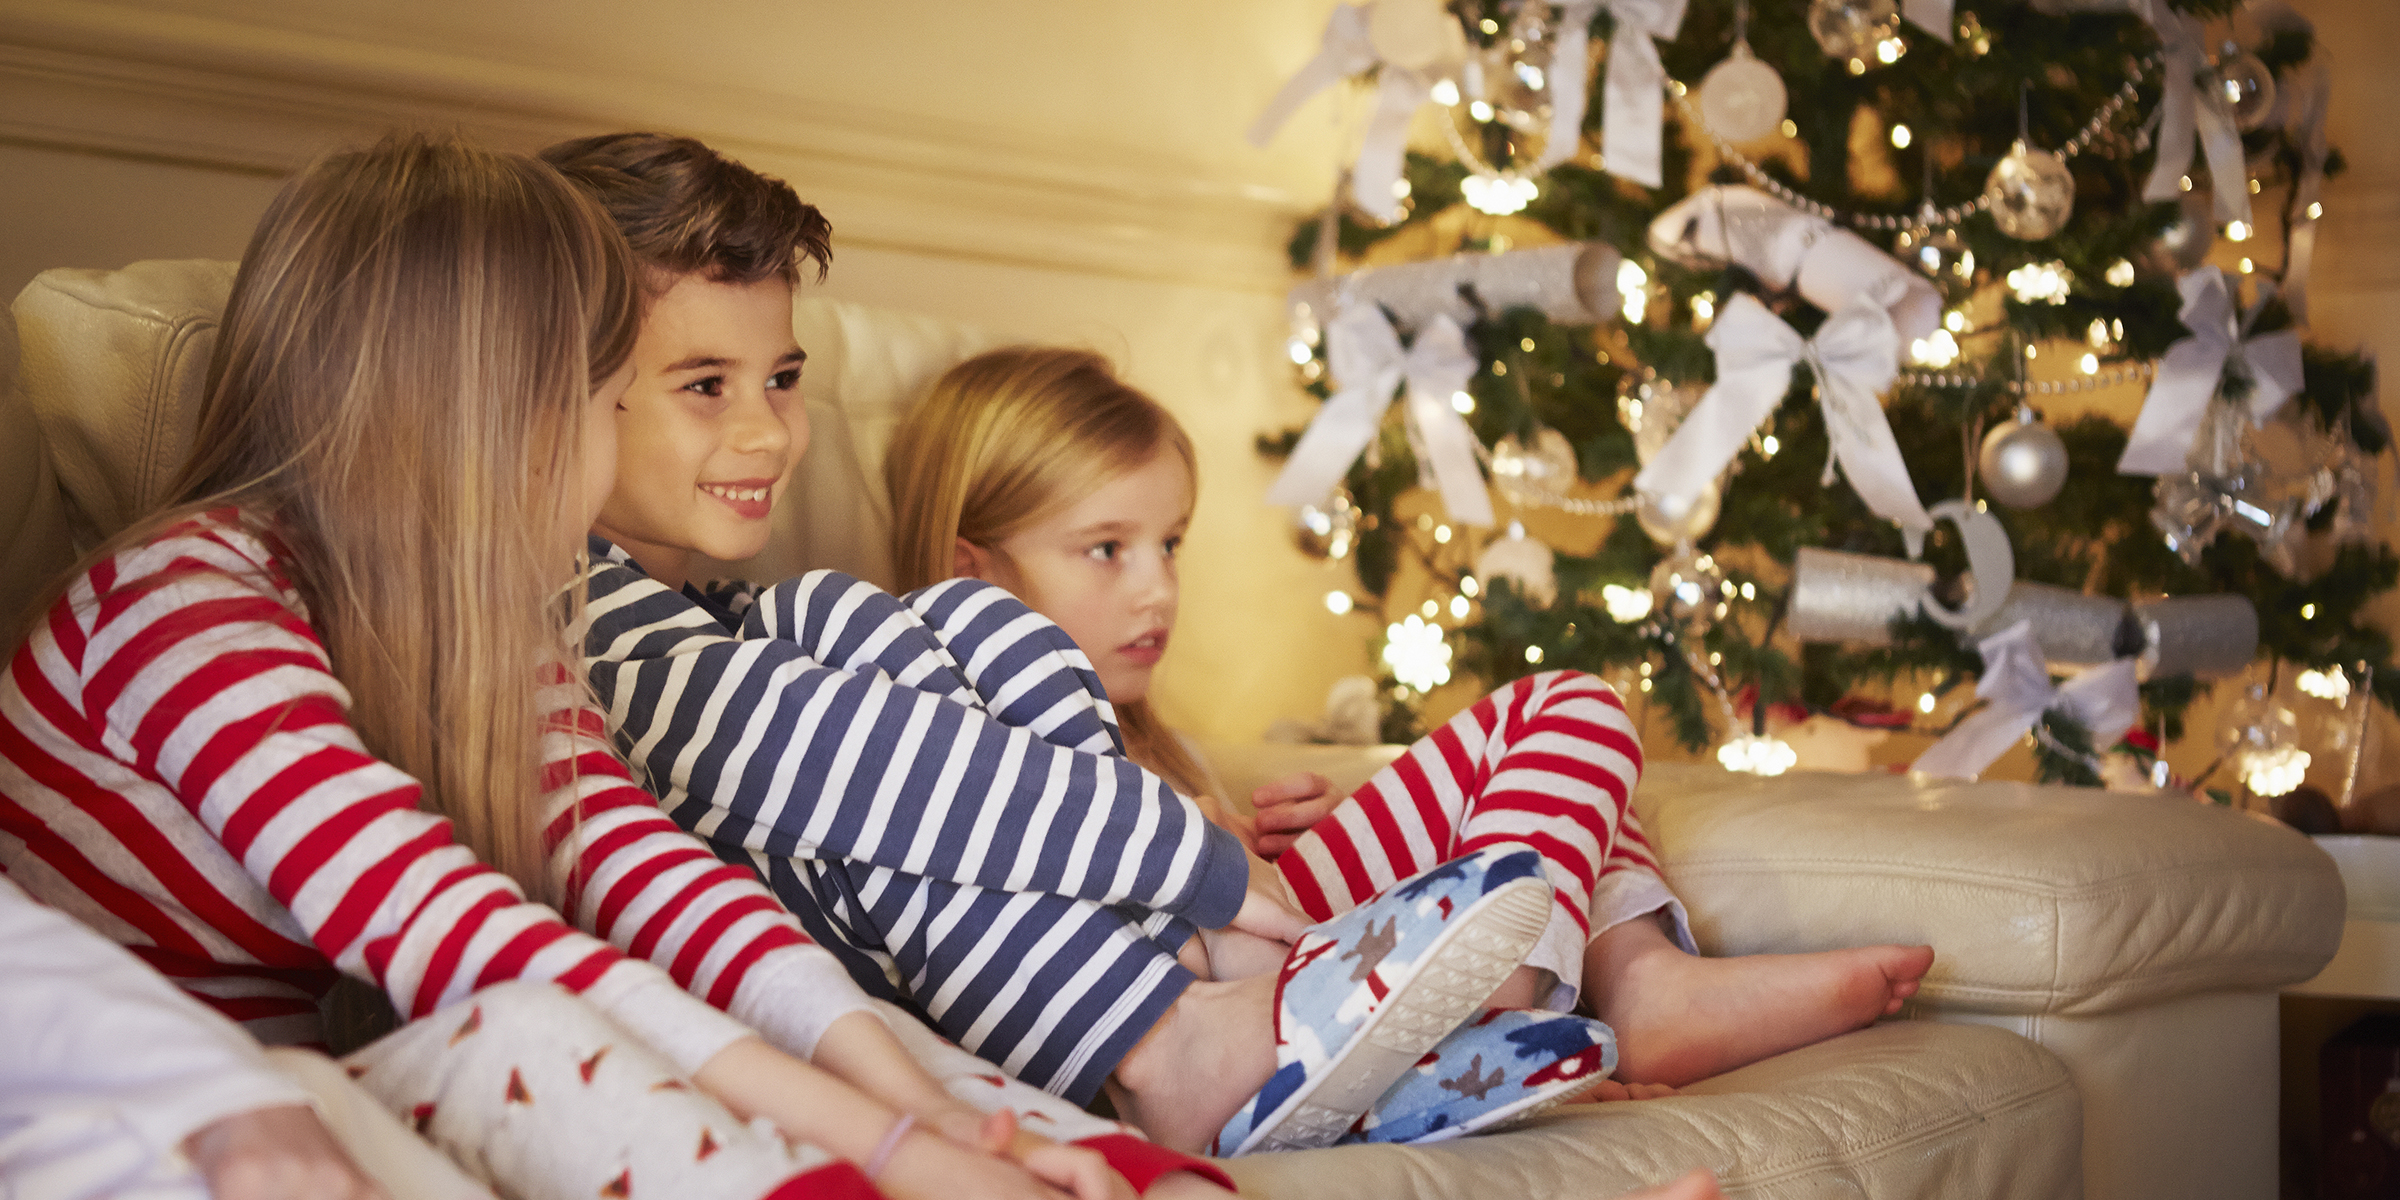 Family Christmas Pajamas Ideas.12 Best Matching Family Pajama Sets For Christmas Or